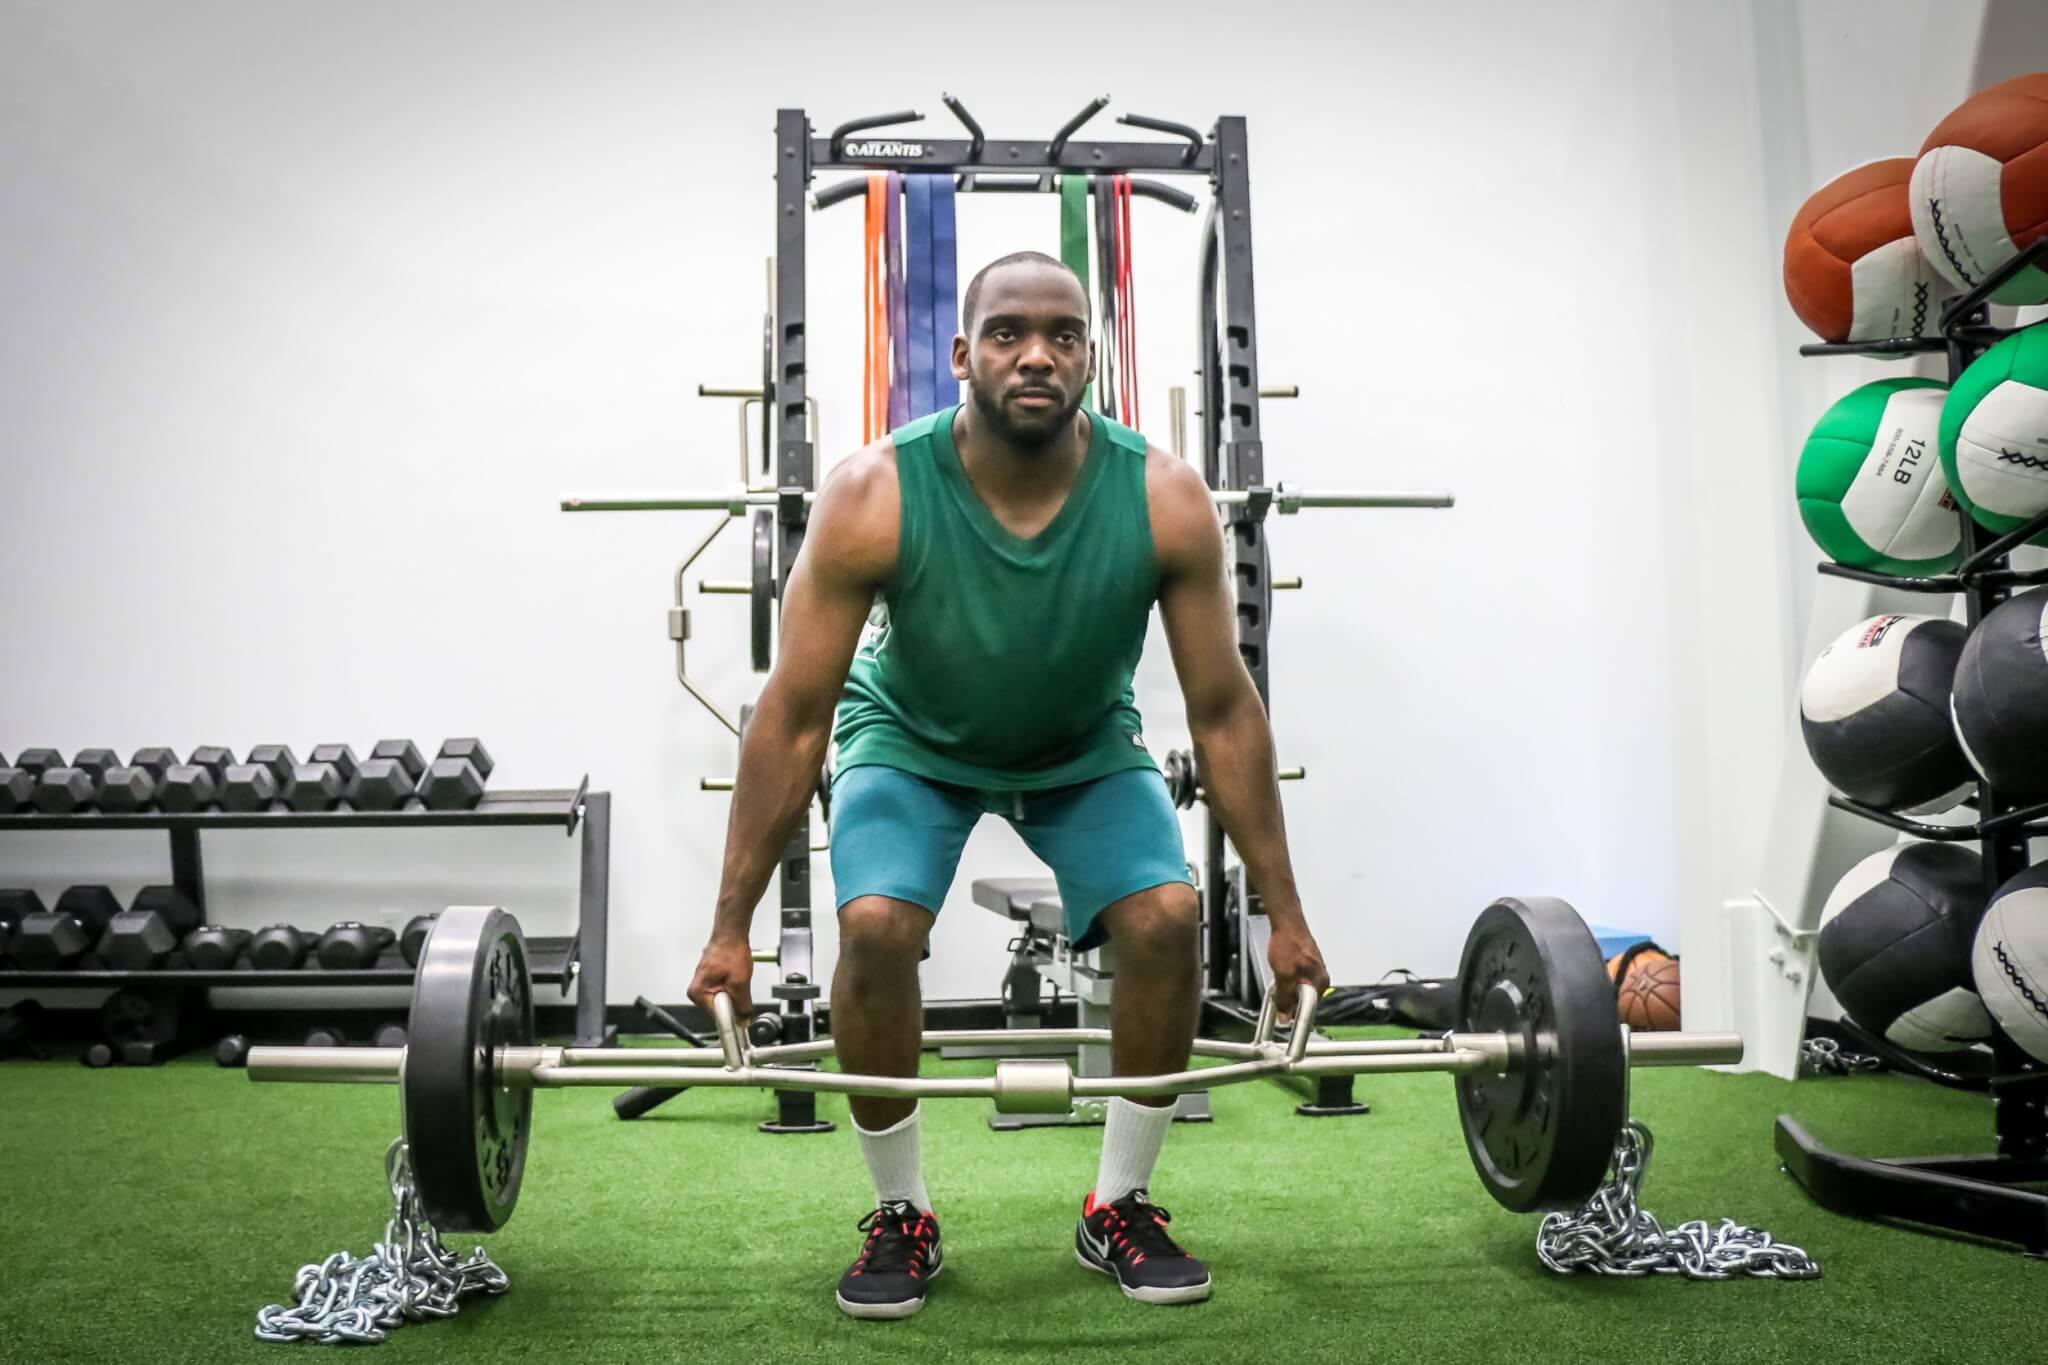 Toronto - Athlete Development Program (Trap Bar DL with Chains)